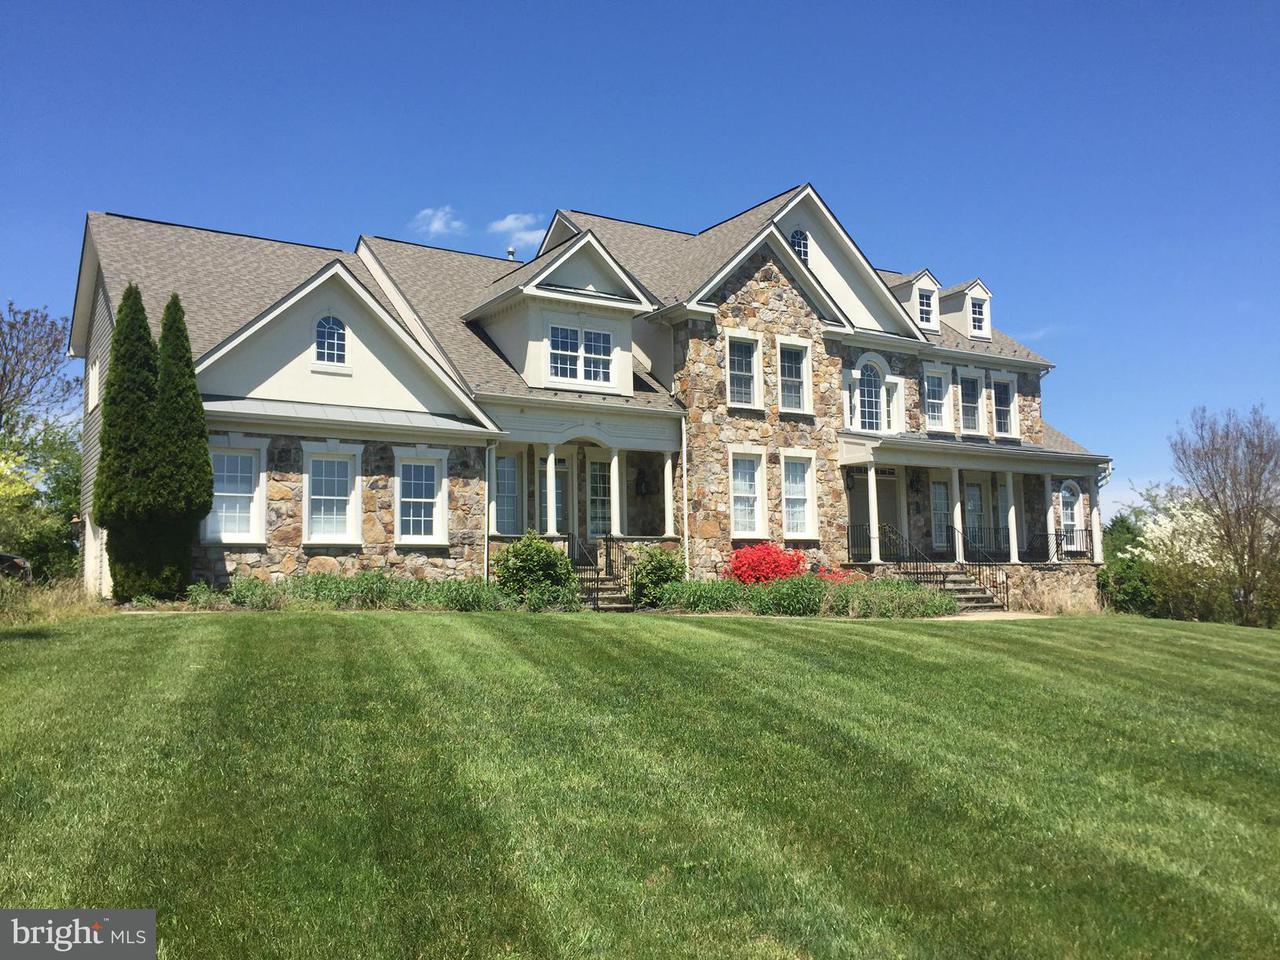 独户住宅 为 销售 在 14416 Monticello Drive 14416 Monticello Drive Cooksville, 马里兰州 21723 美国